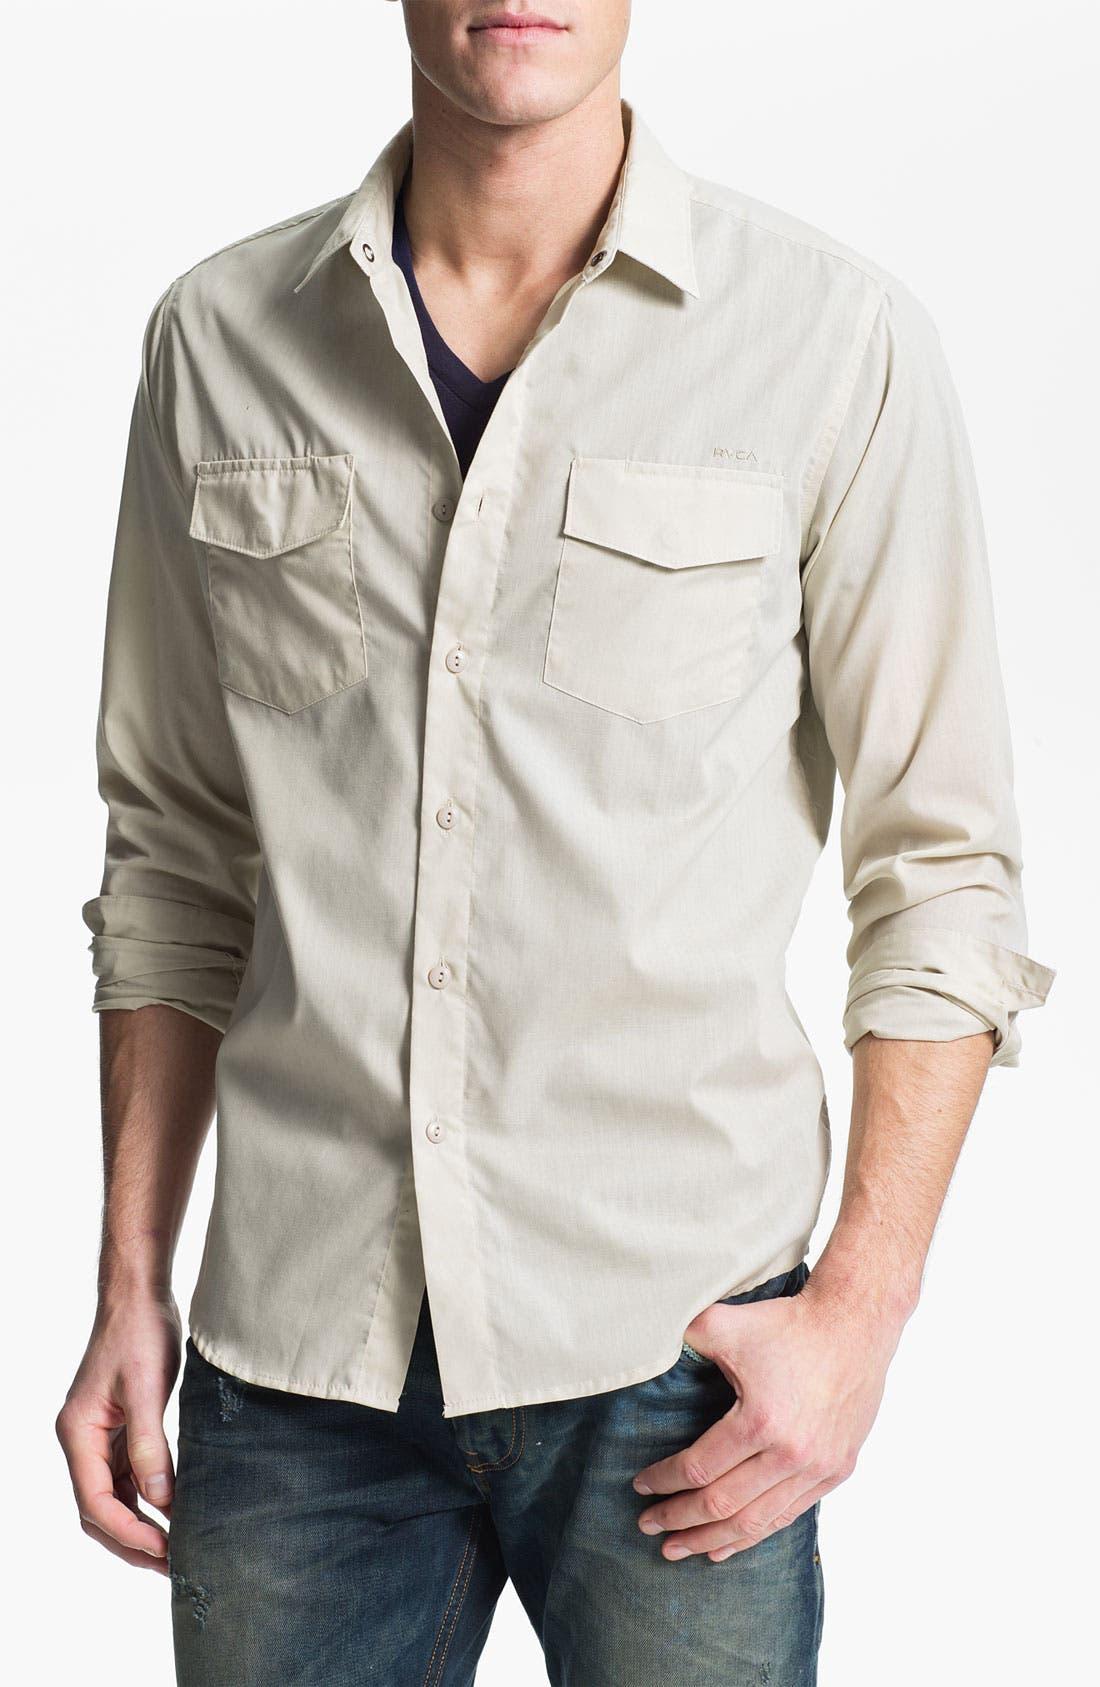 Main Image - RVCA 'Republic' Woven Shirt